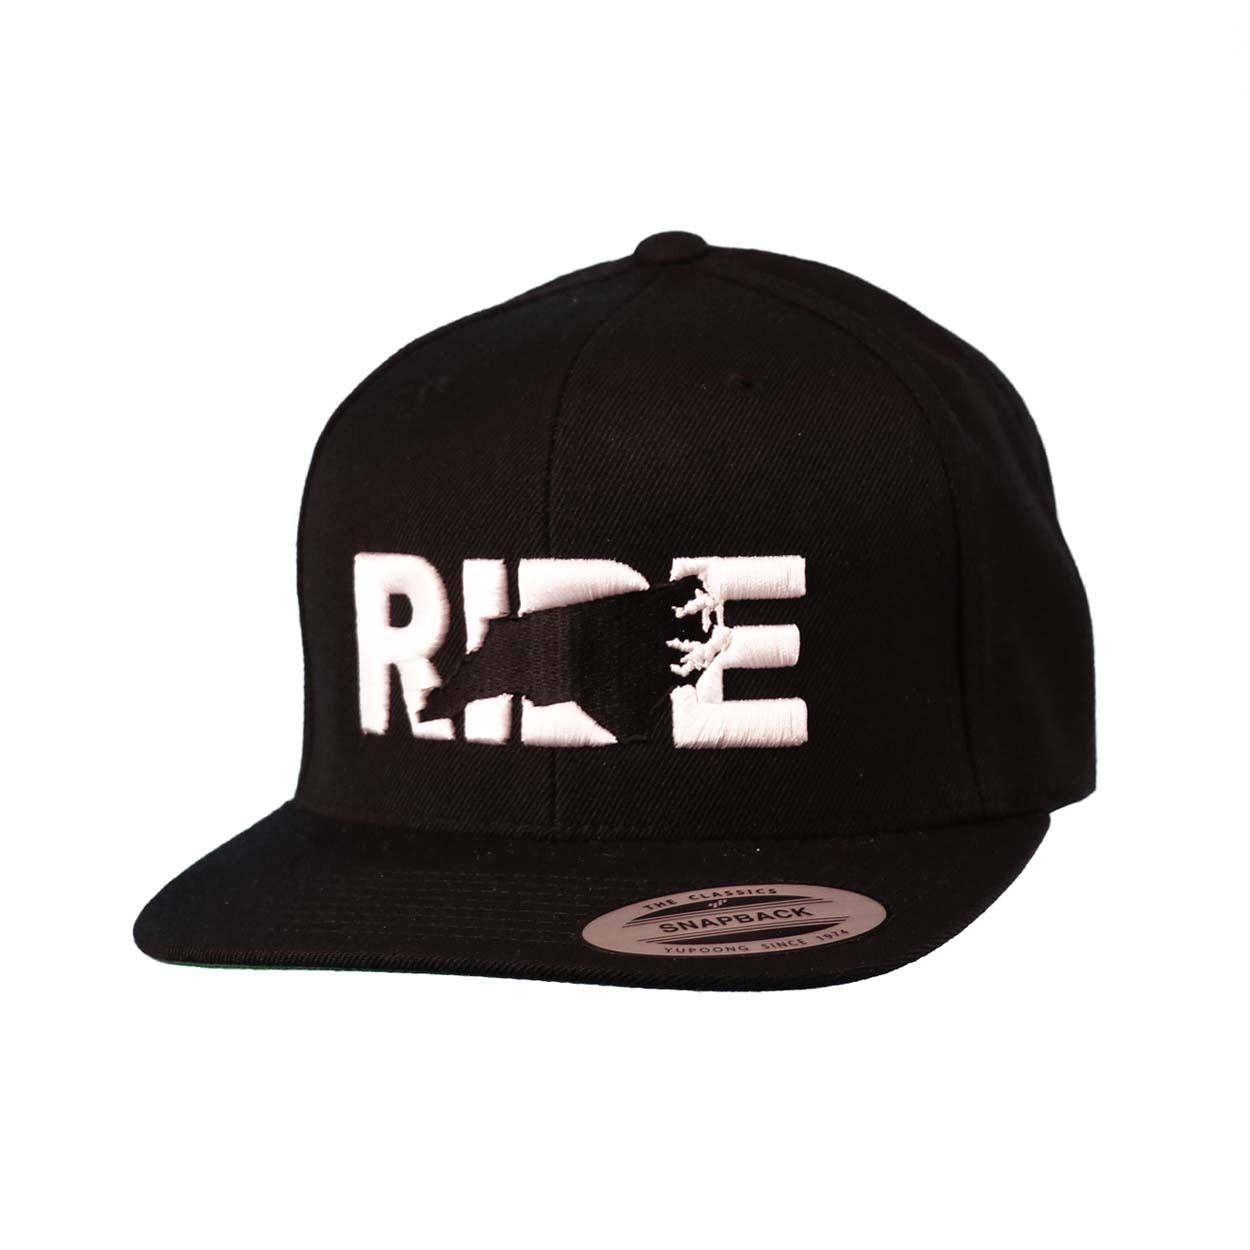 Ride North Carolina Classic Embroidered  Snapback Flat Brim Hat Black/White